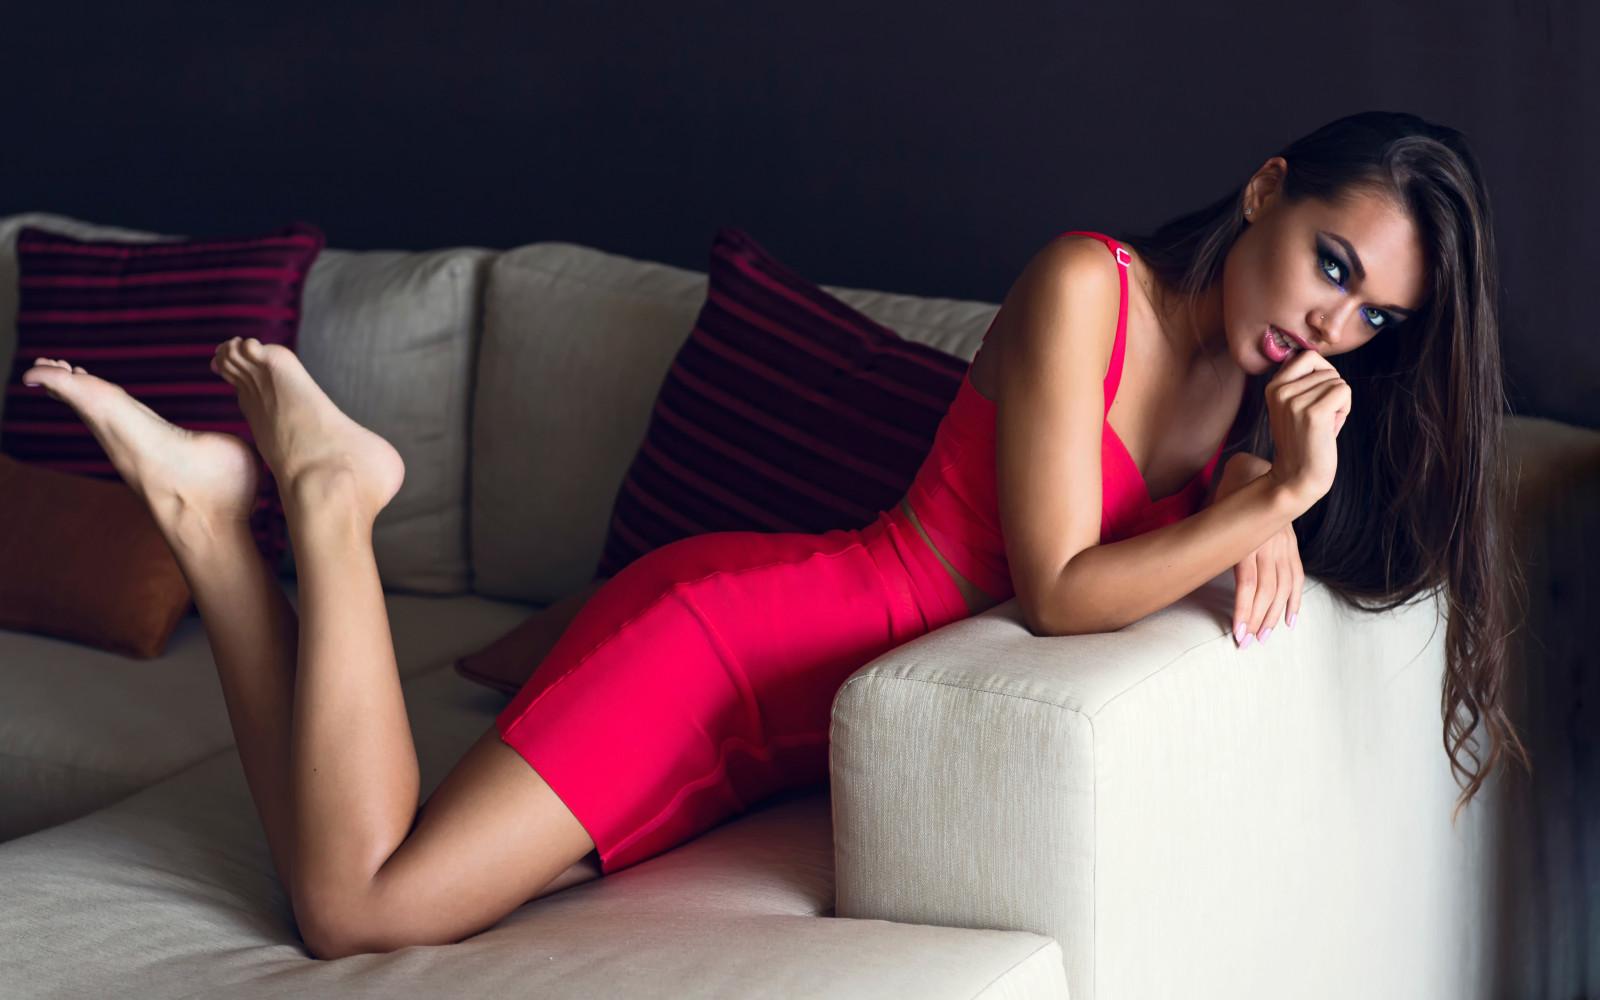 Dutta full x hot girls nude vids pornstar